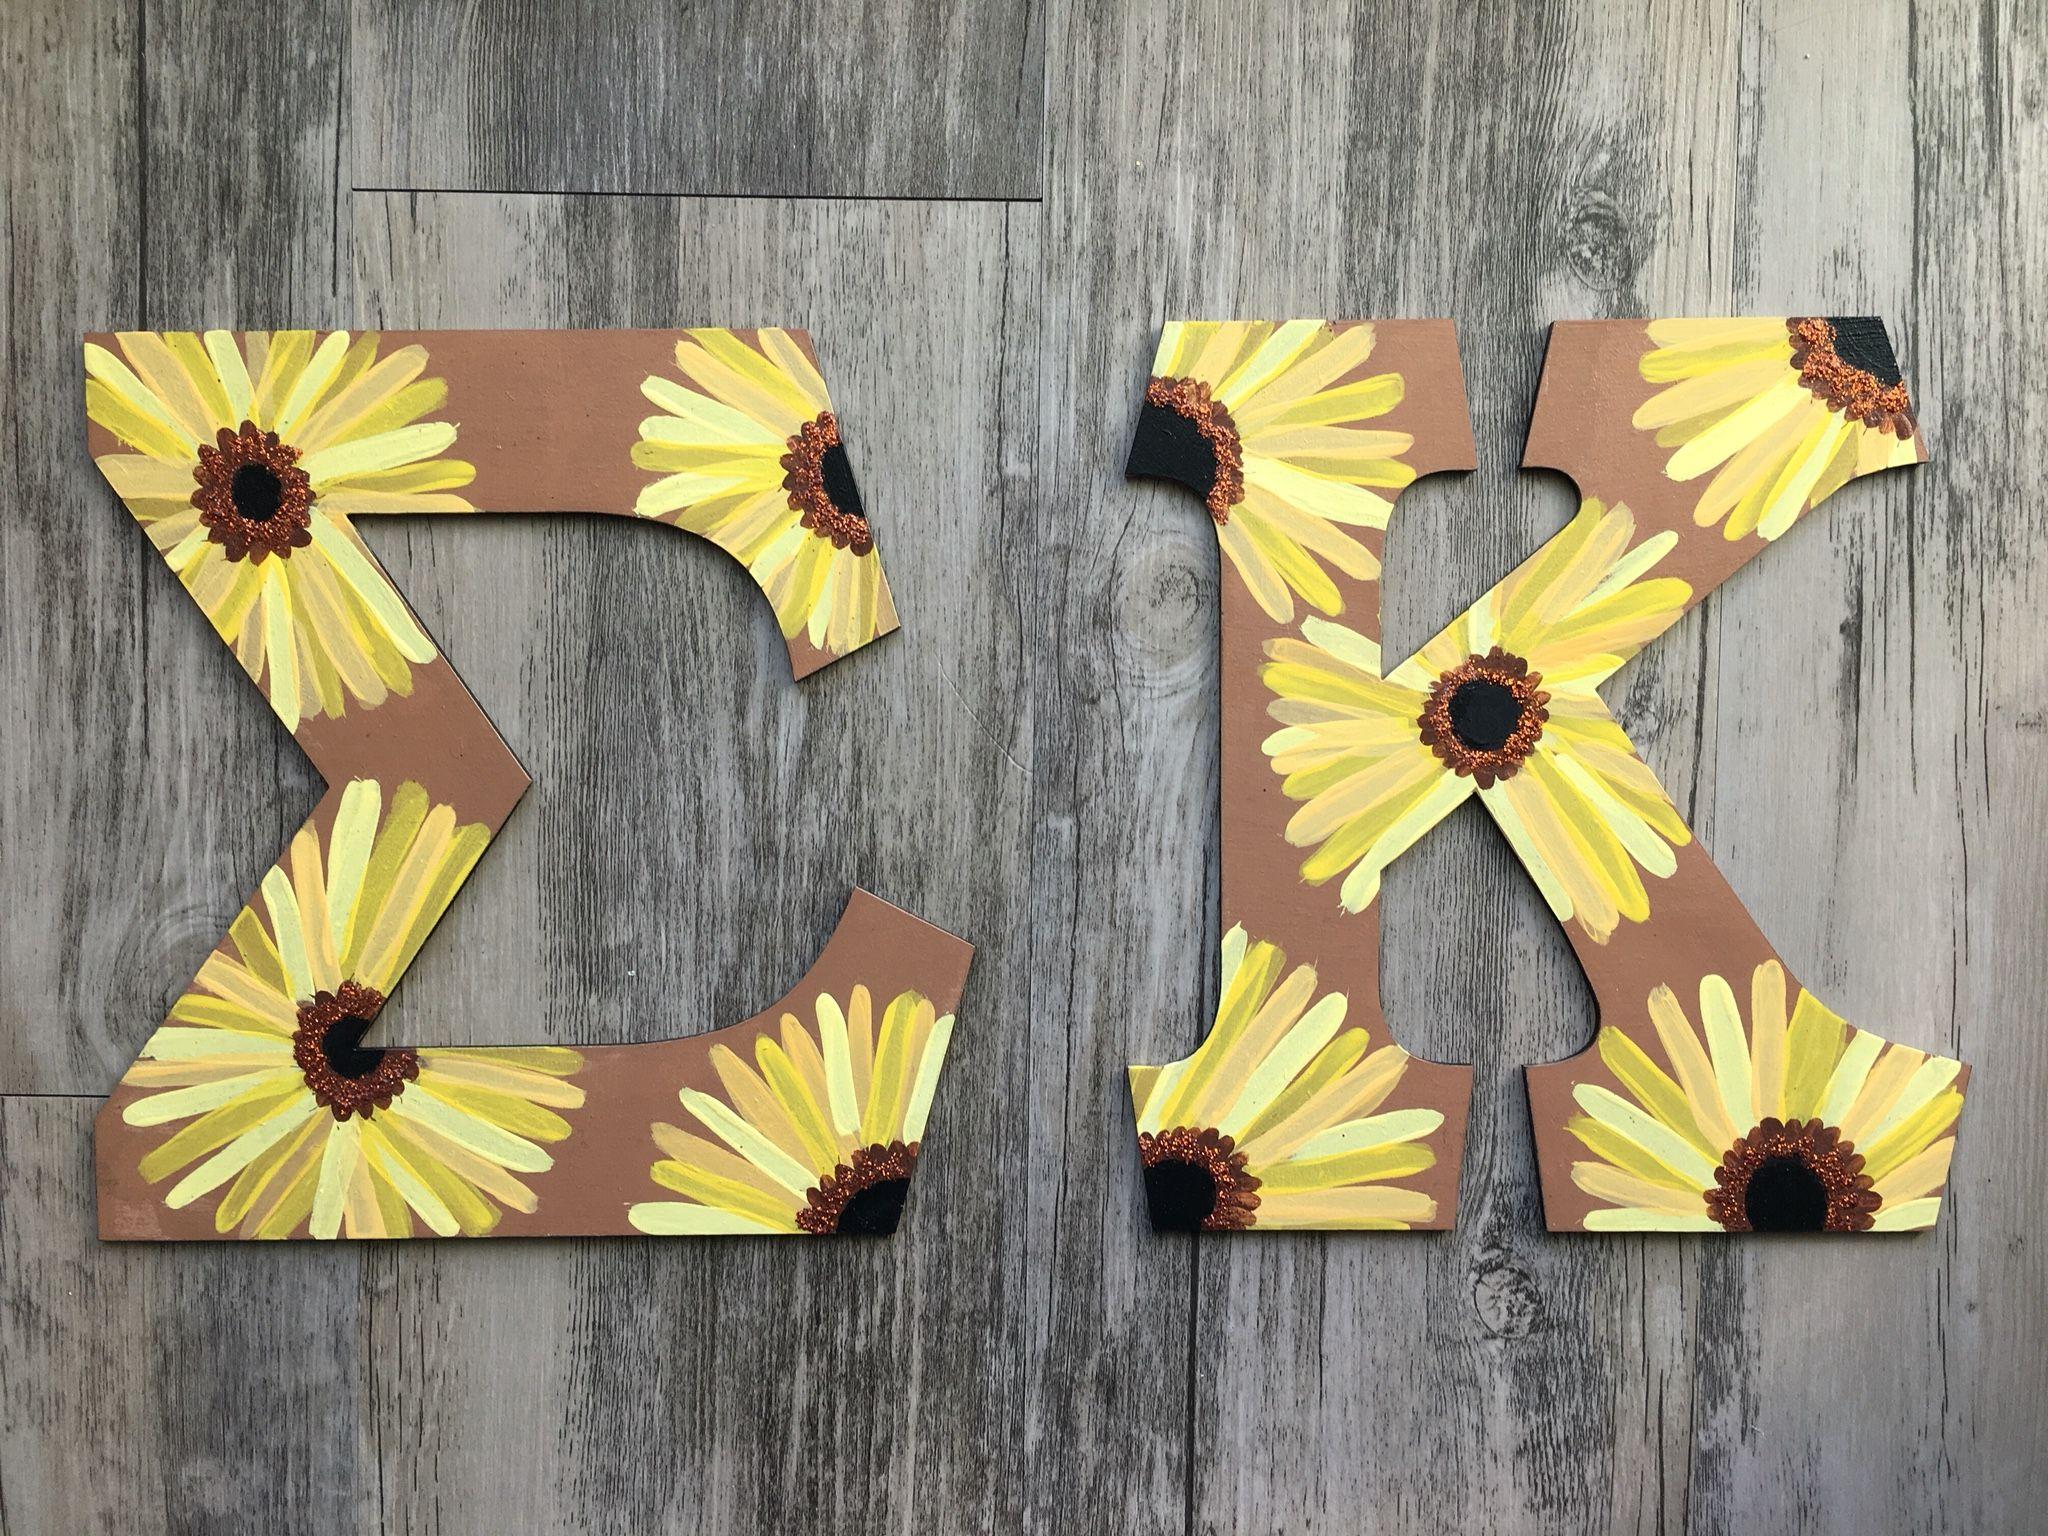 Sigma kappa letters sunflowers big little crafts sorority for Sorority crafts for little